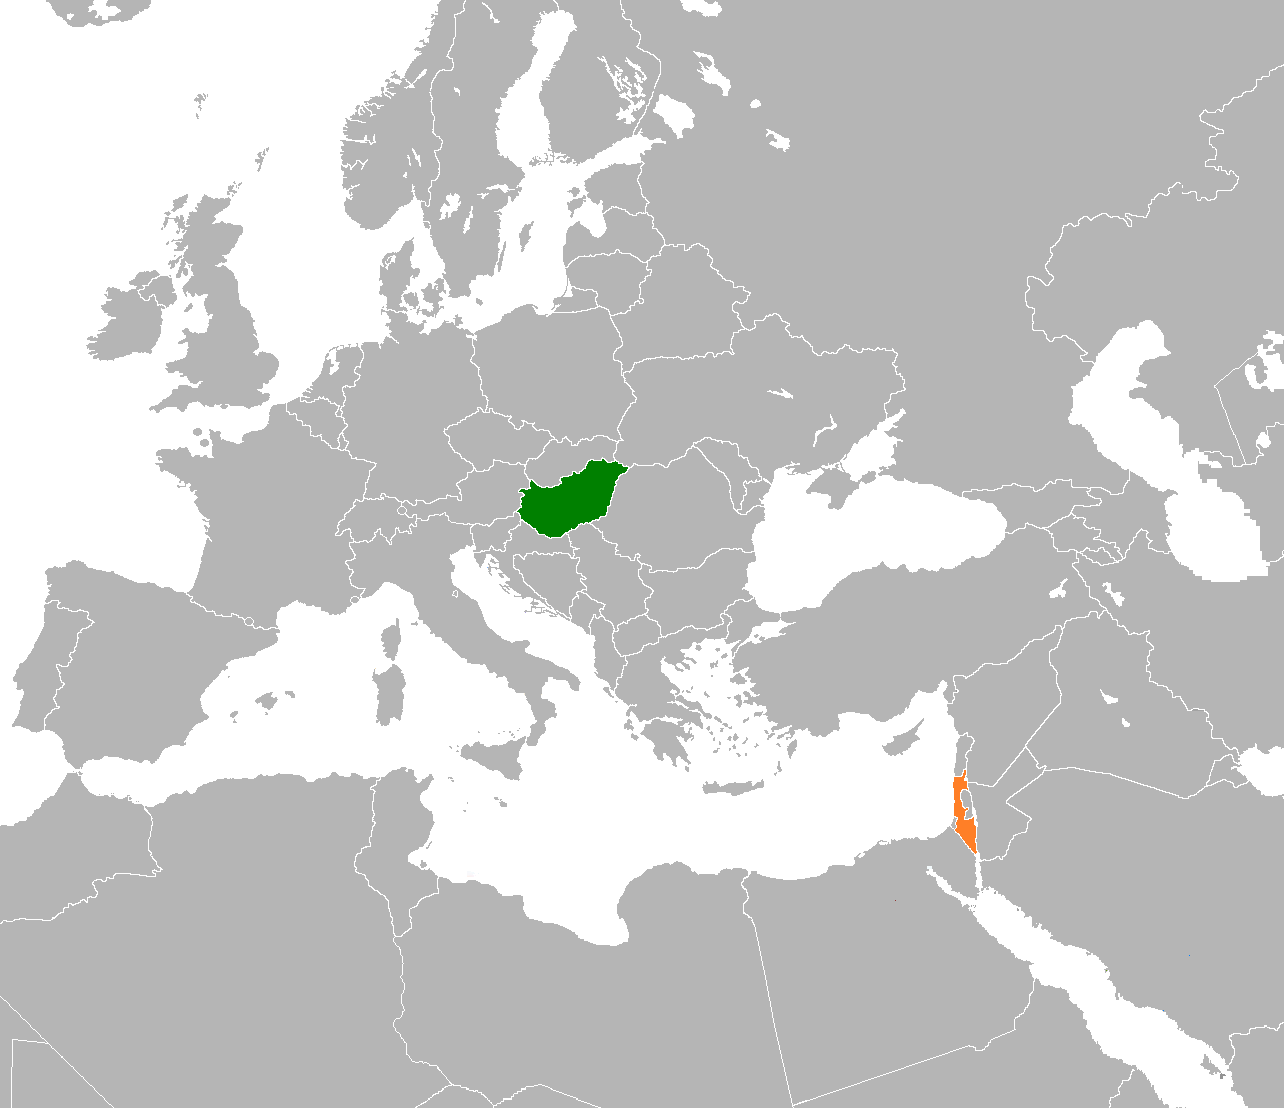 Filehungary israel locatorg wikimedia commons filehungary israel locatorg gumiabroncs Choice Image